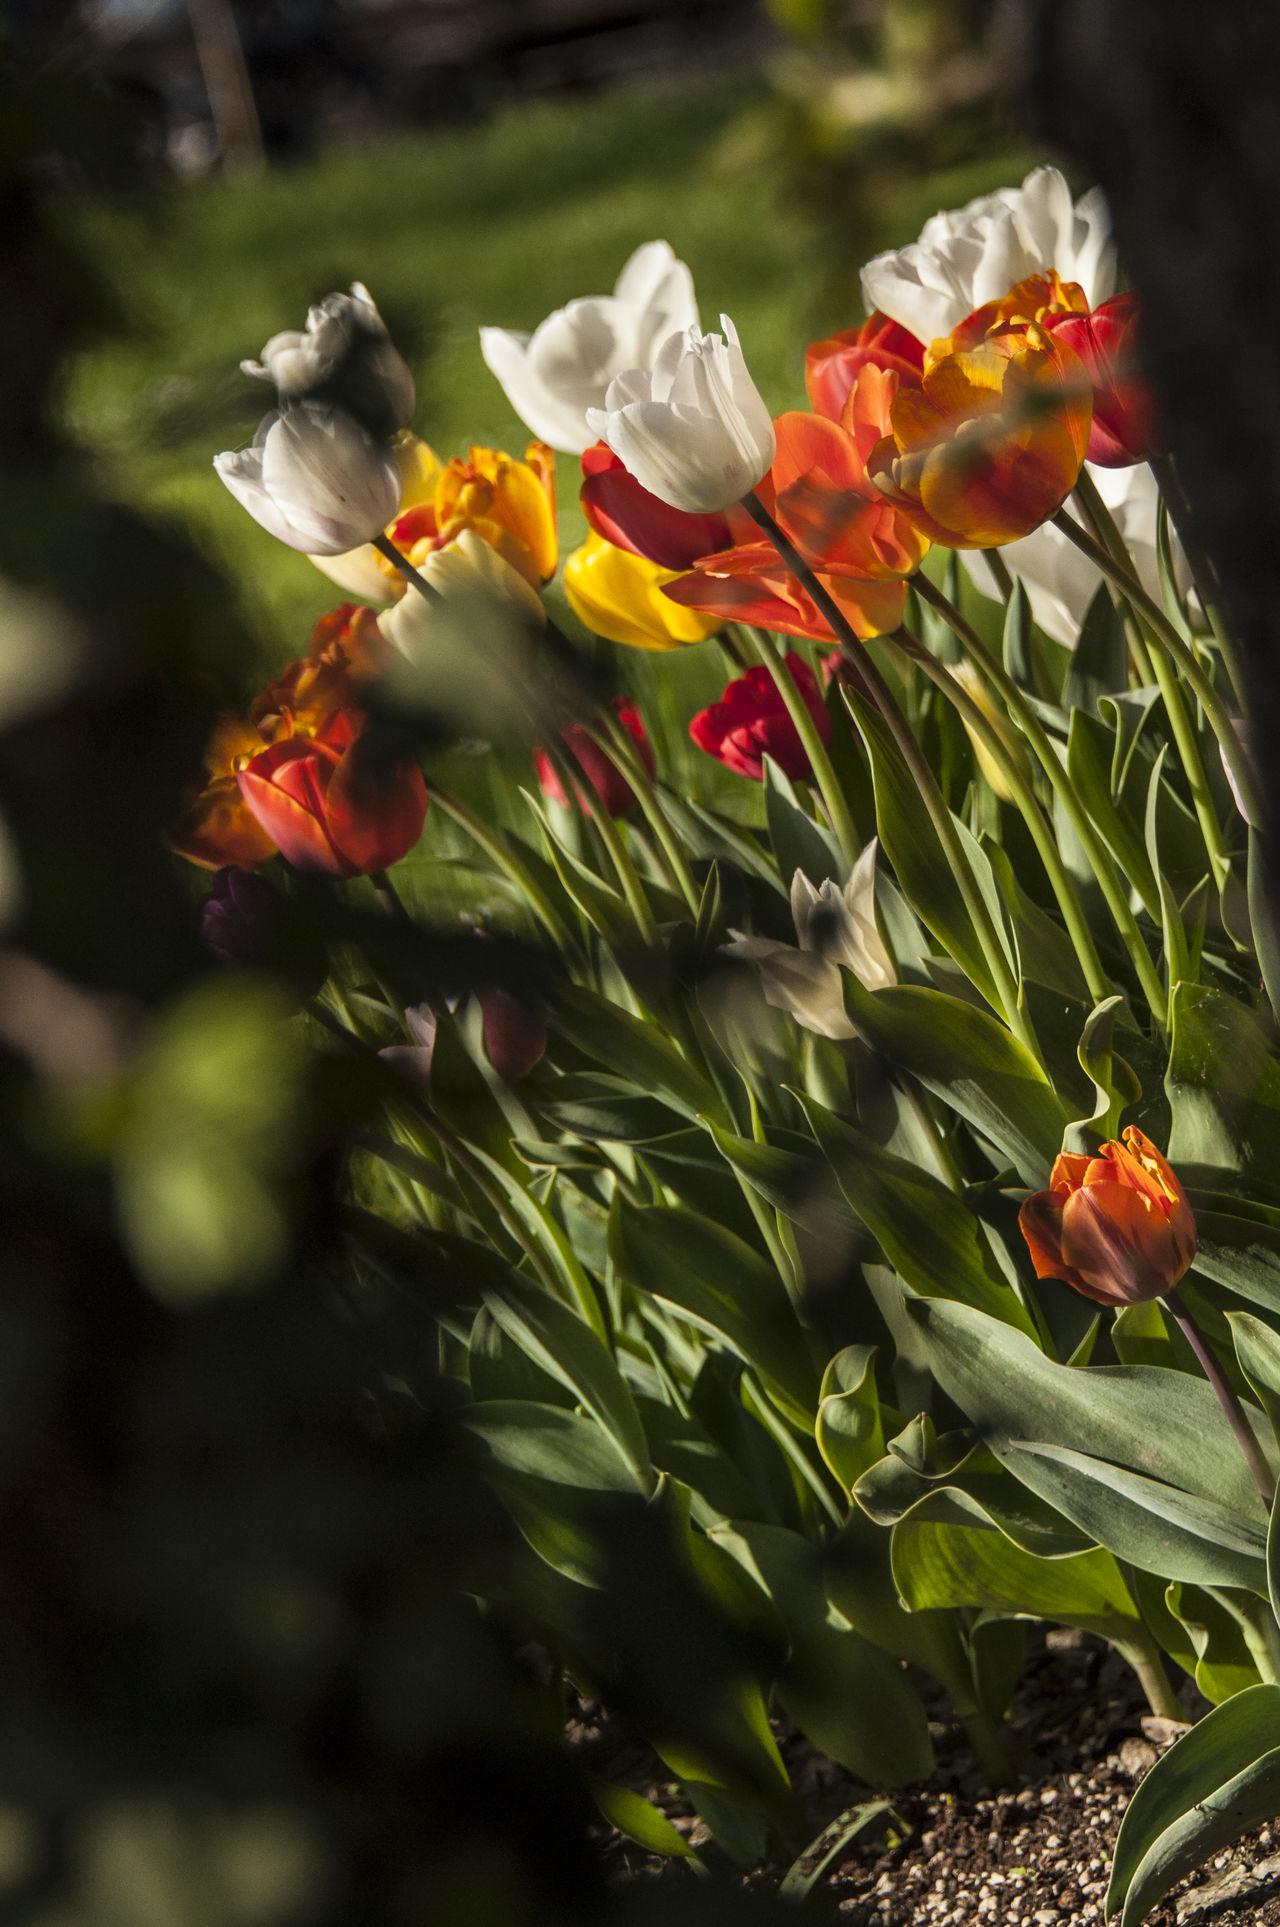 Colorfull EyeEm Nature Lover Flower Collection Flowers Flowers,Plants & Garden Garden Pralormo Tulip